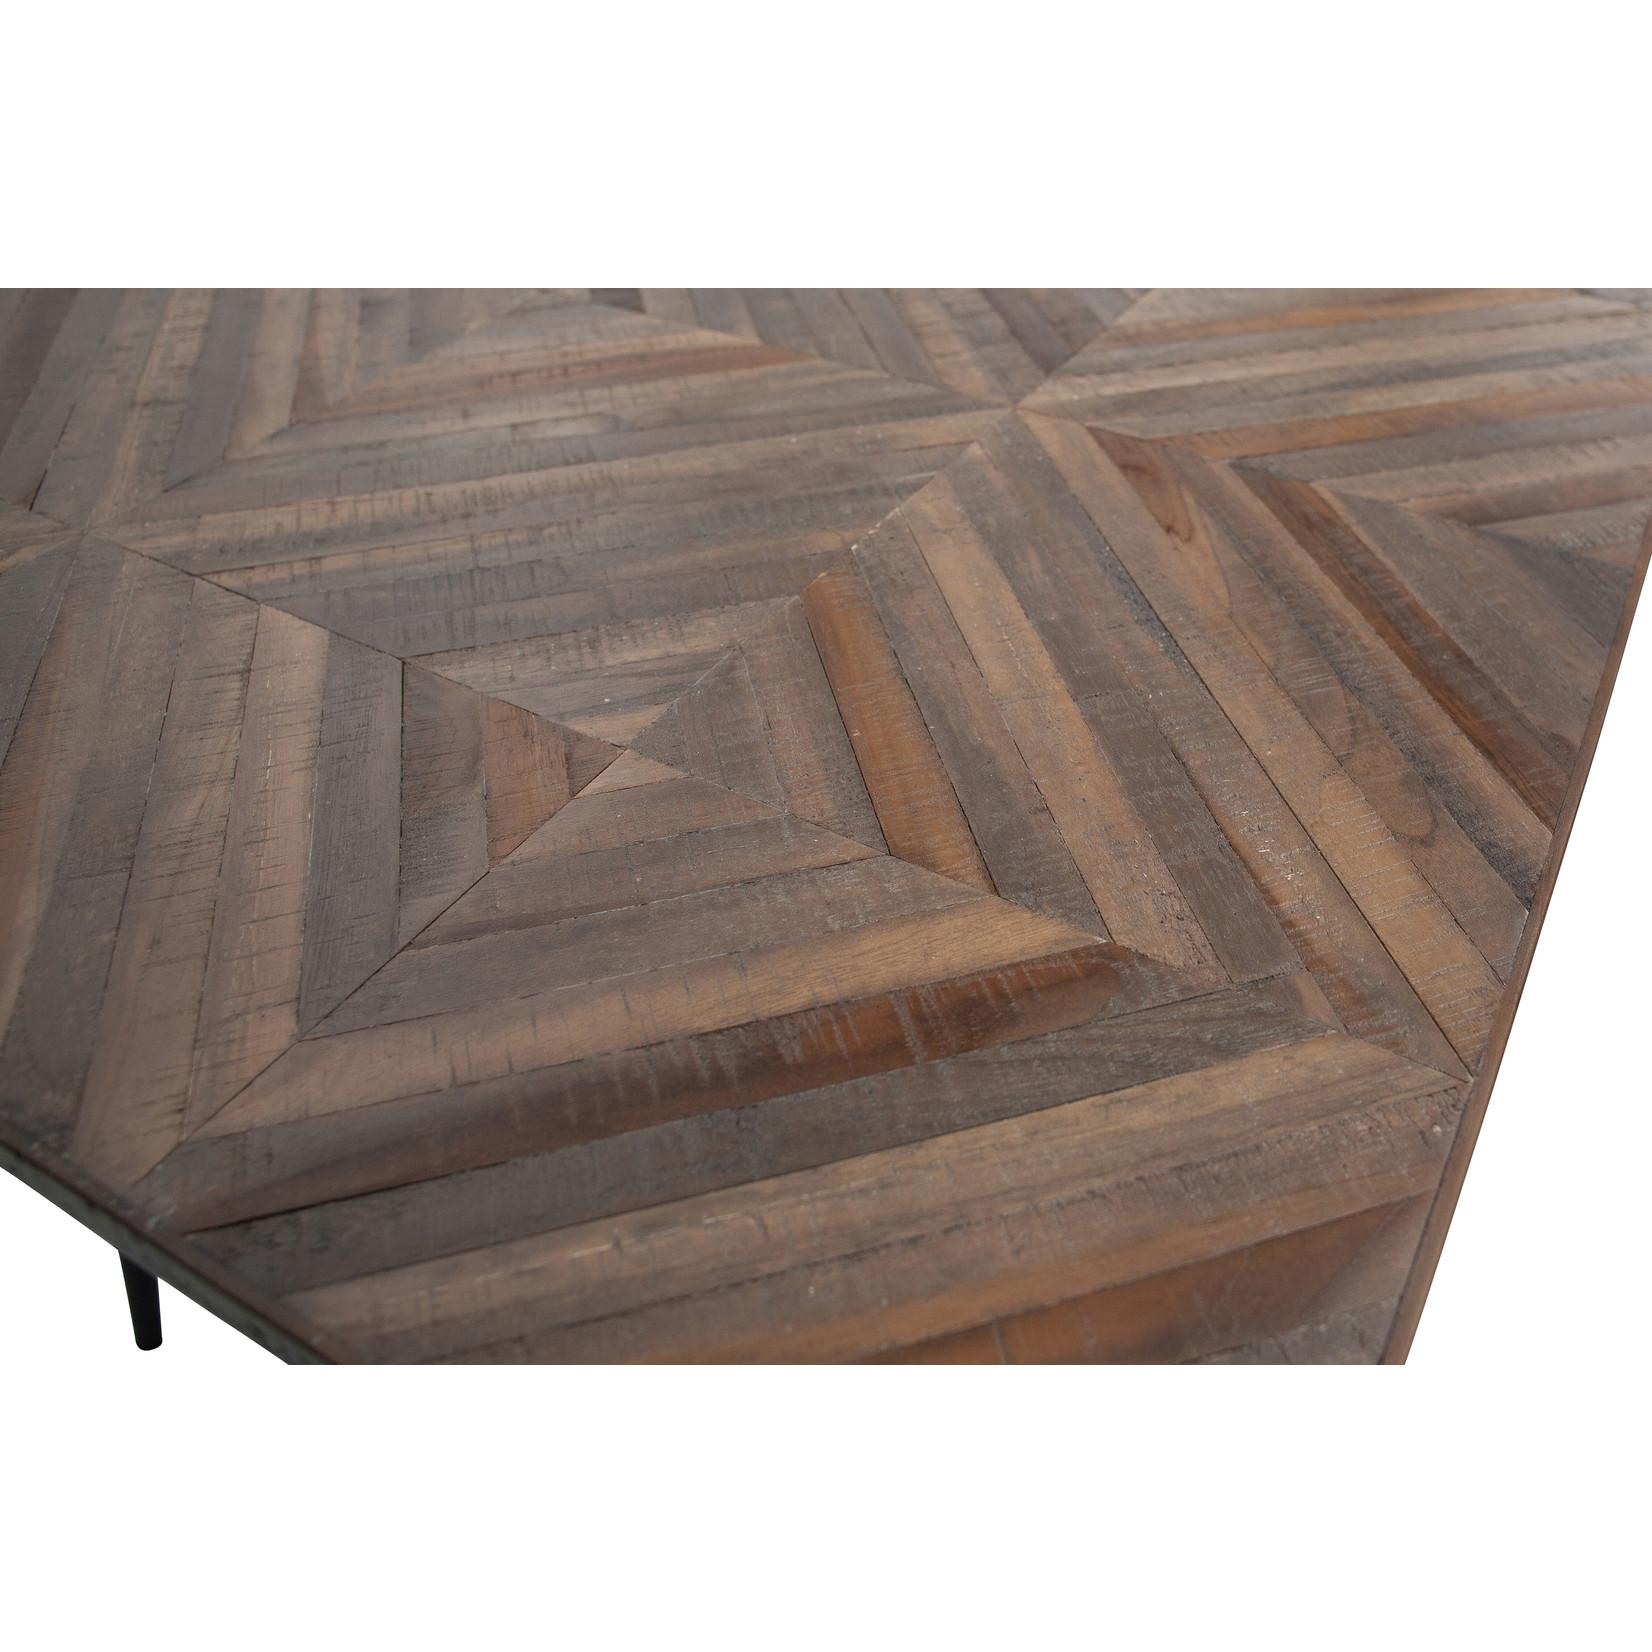 Be Pure Home Rhombic Eettafel 180x90cm Hout/metaal